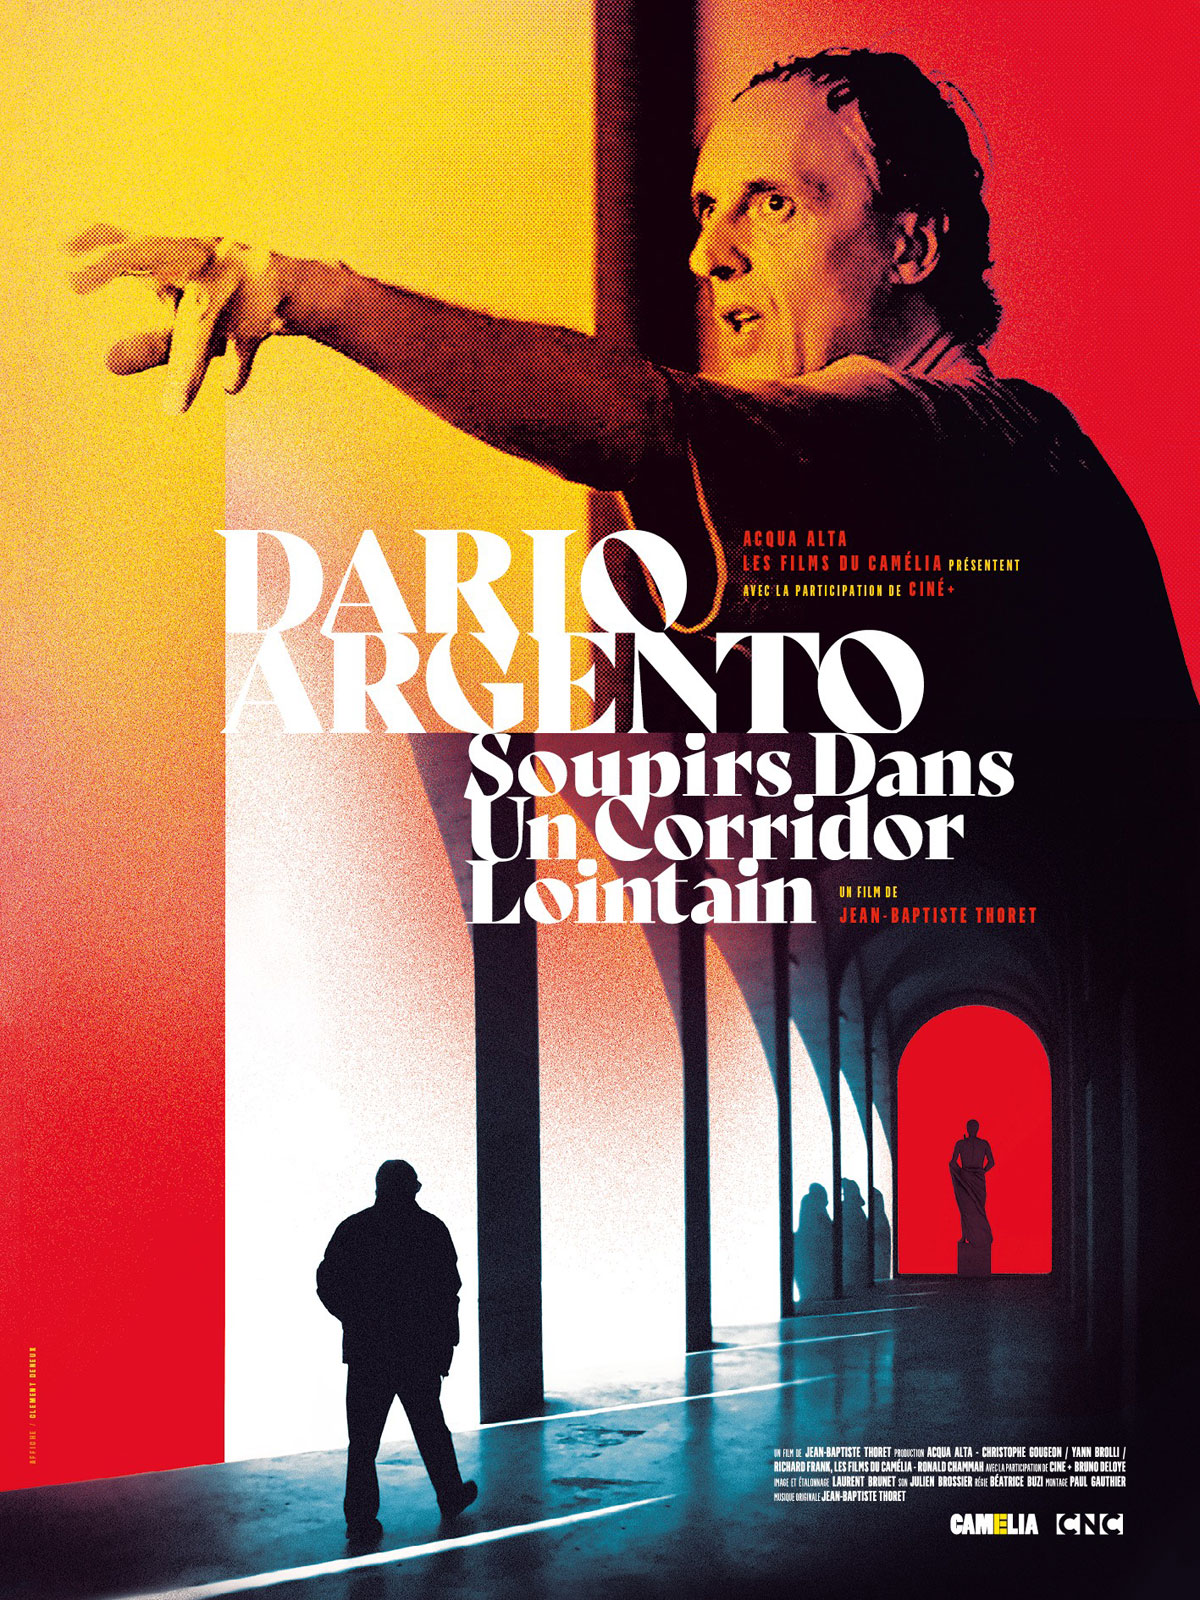 Image du film Dario Argento: Soupirs Dans Un Corridor Lointain